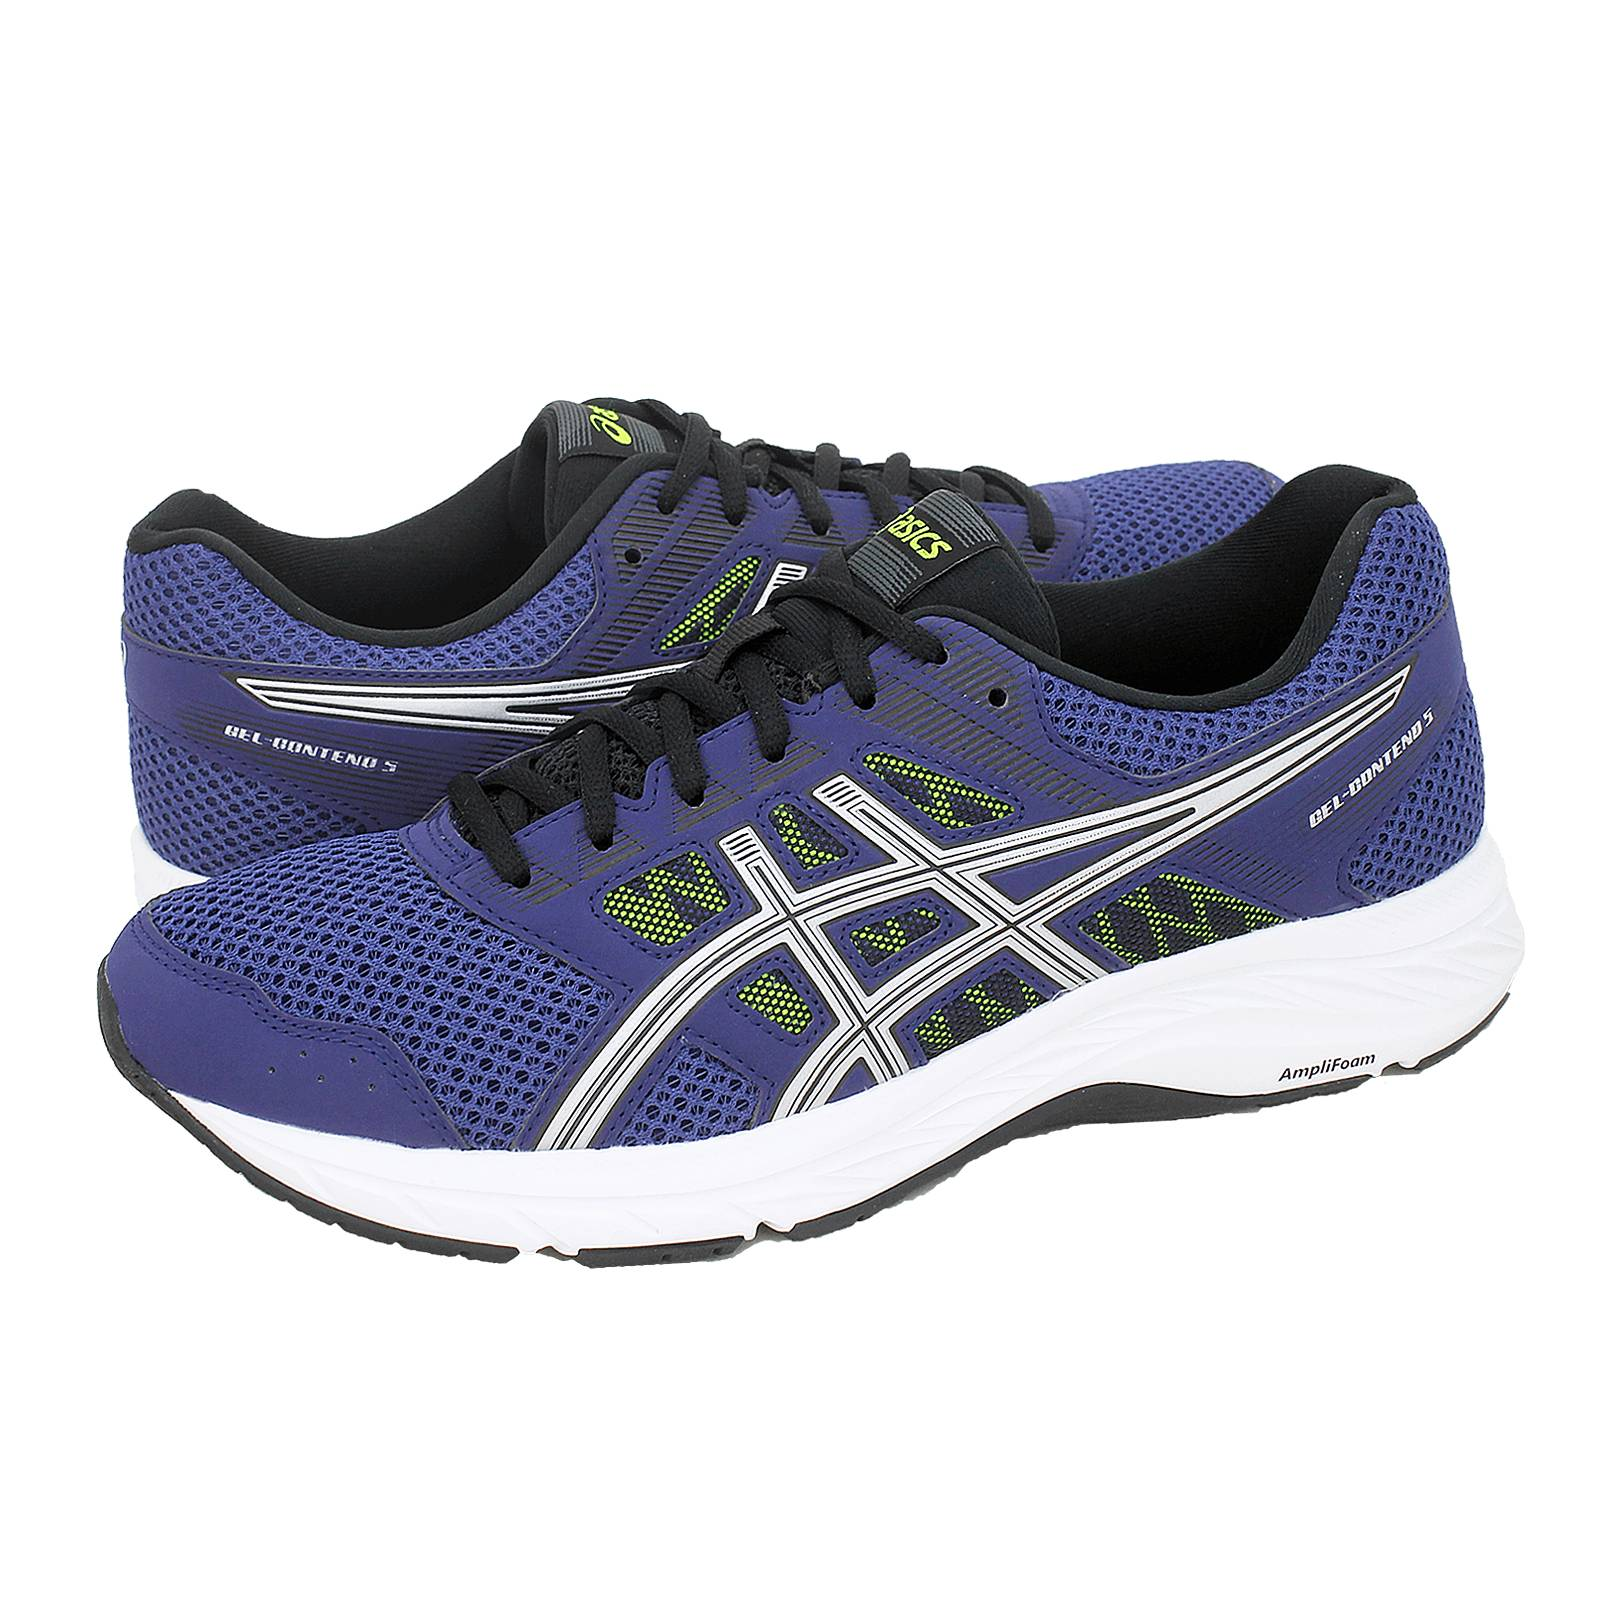 a54158f82b1 Gel-Contend 5 - Ανδρικά αθλητικά παπούτσια Asics από υφασμα και ...